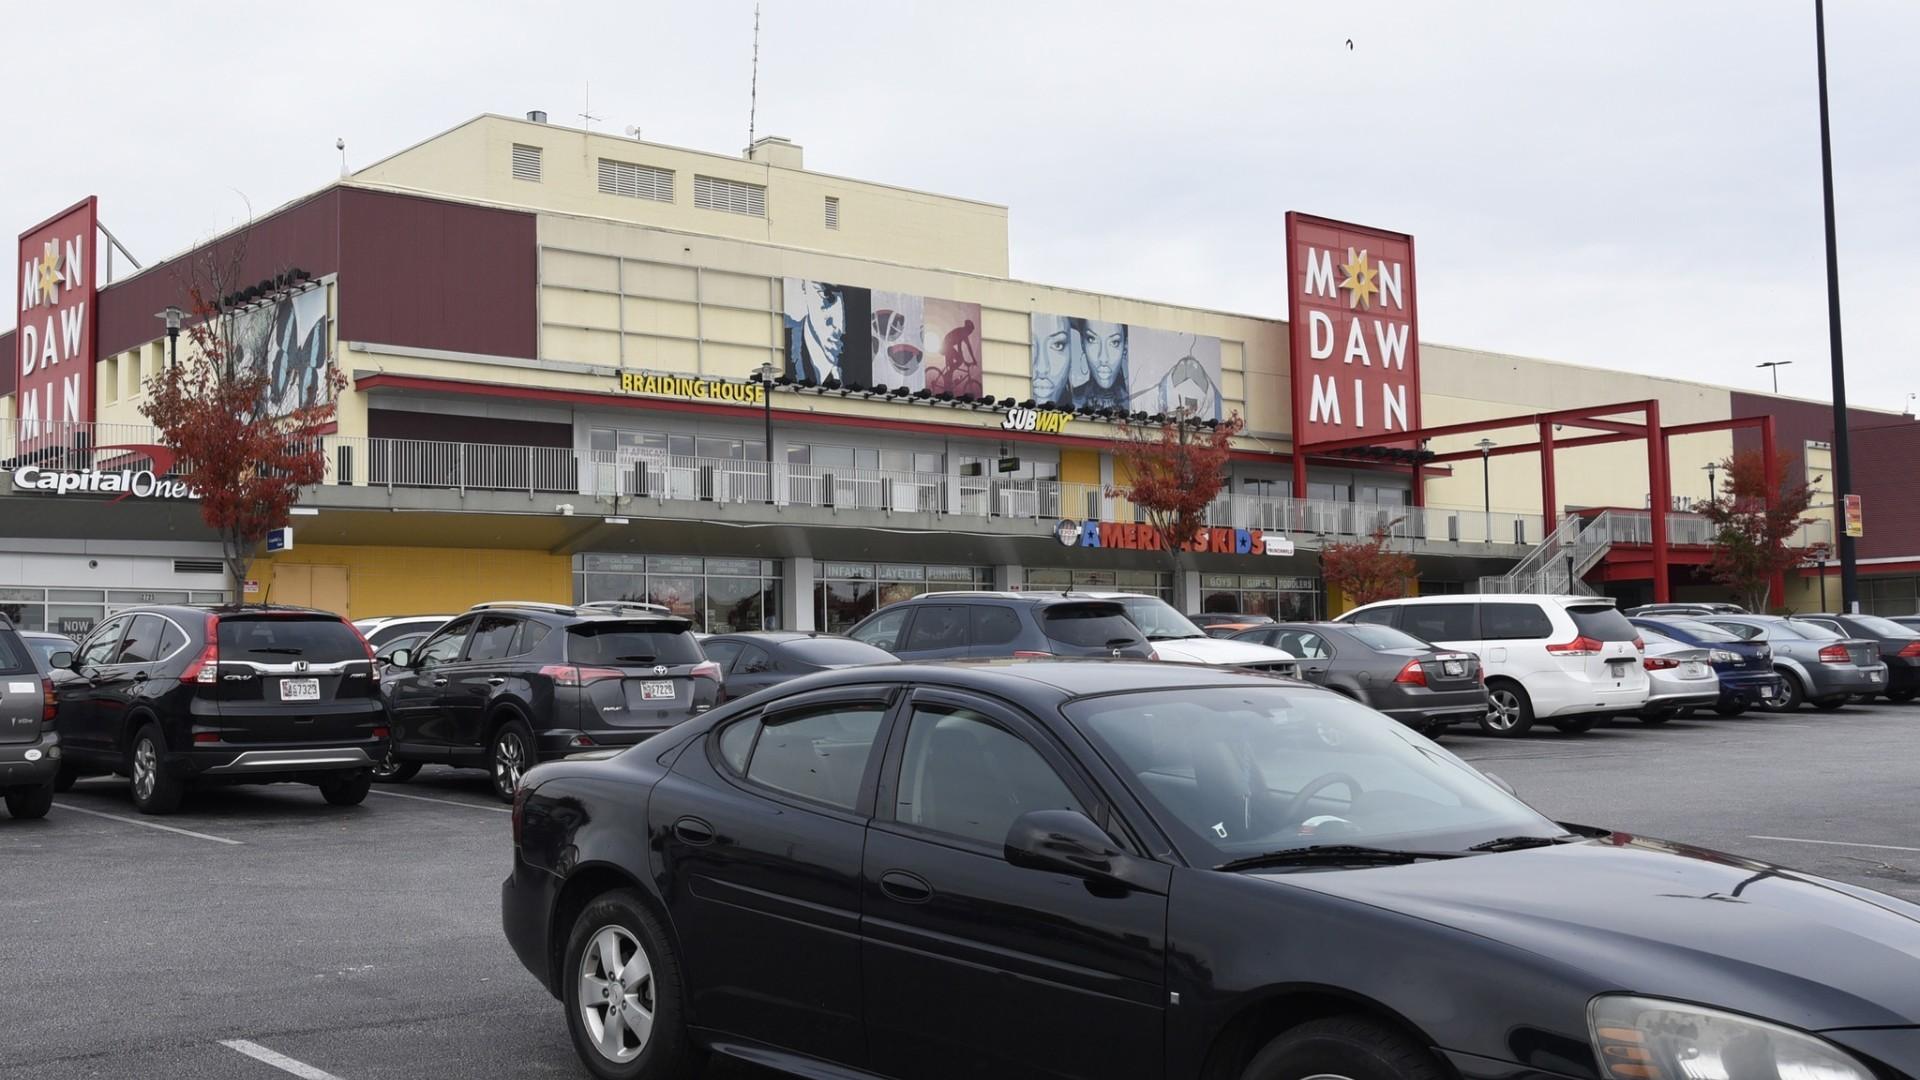 Community leader hoping to sustain progress around Mondawmin Mall